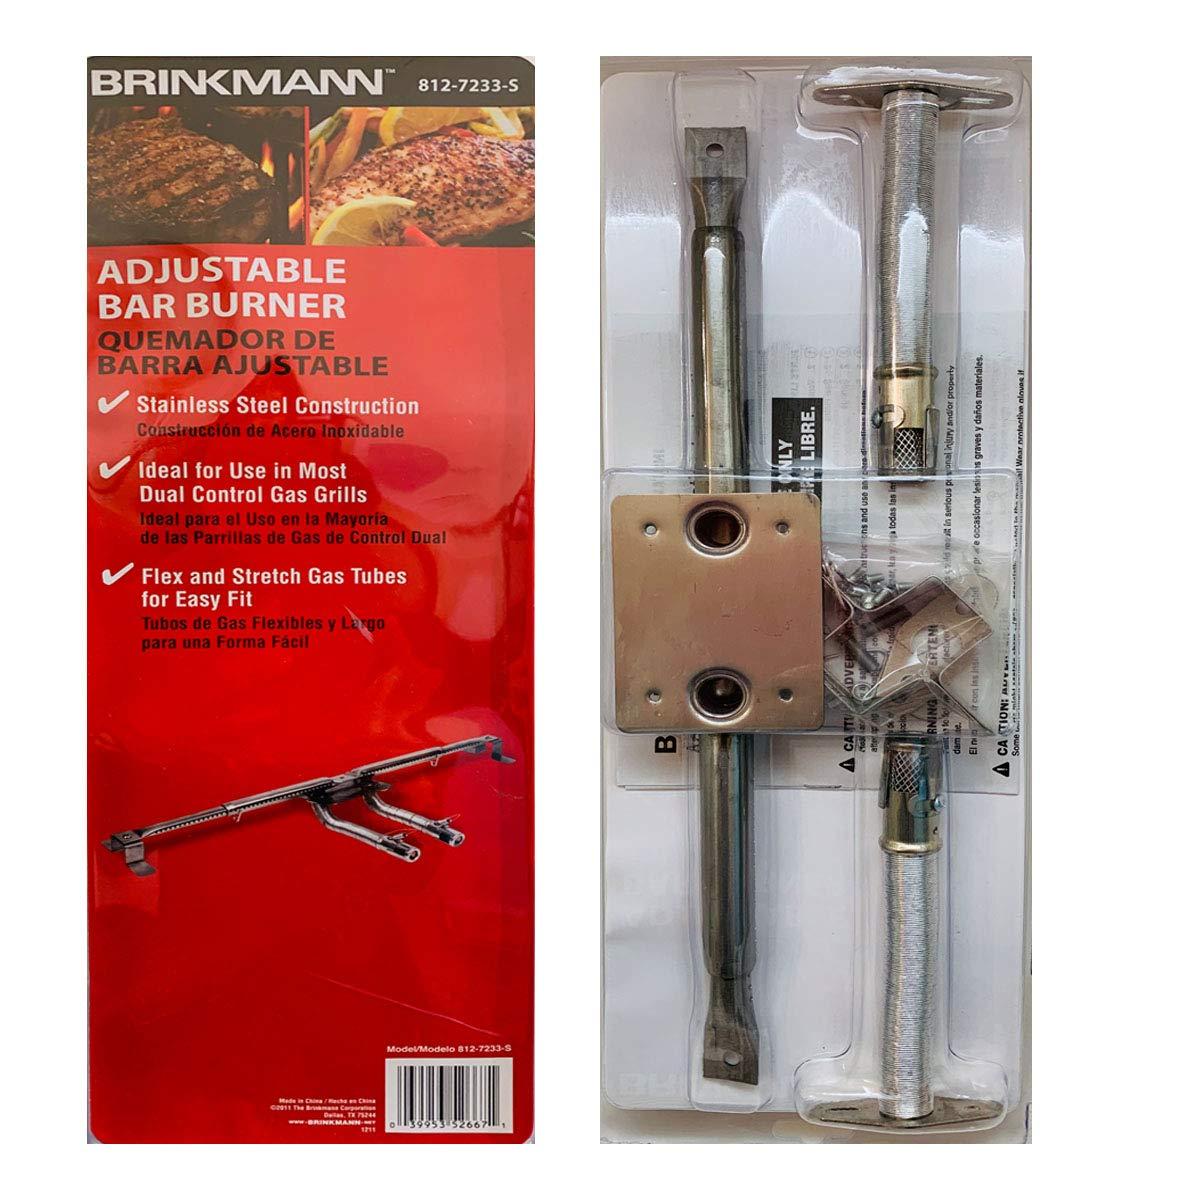 Amazon.com : Brinkmann Adjustable Bar Burner Stainless Steel ...